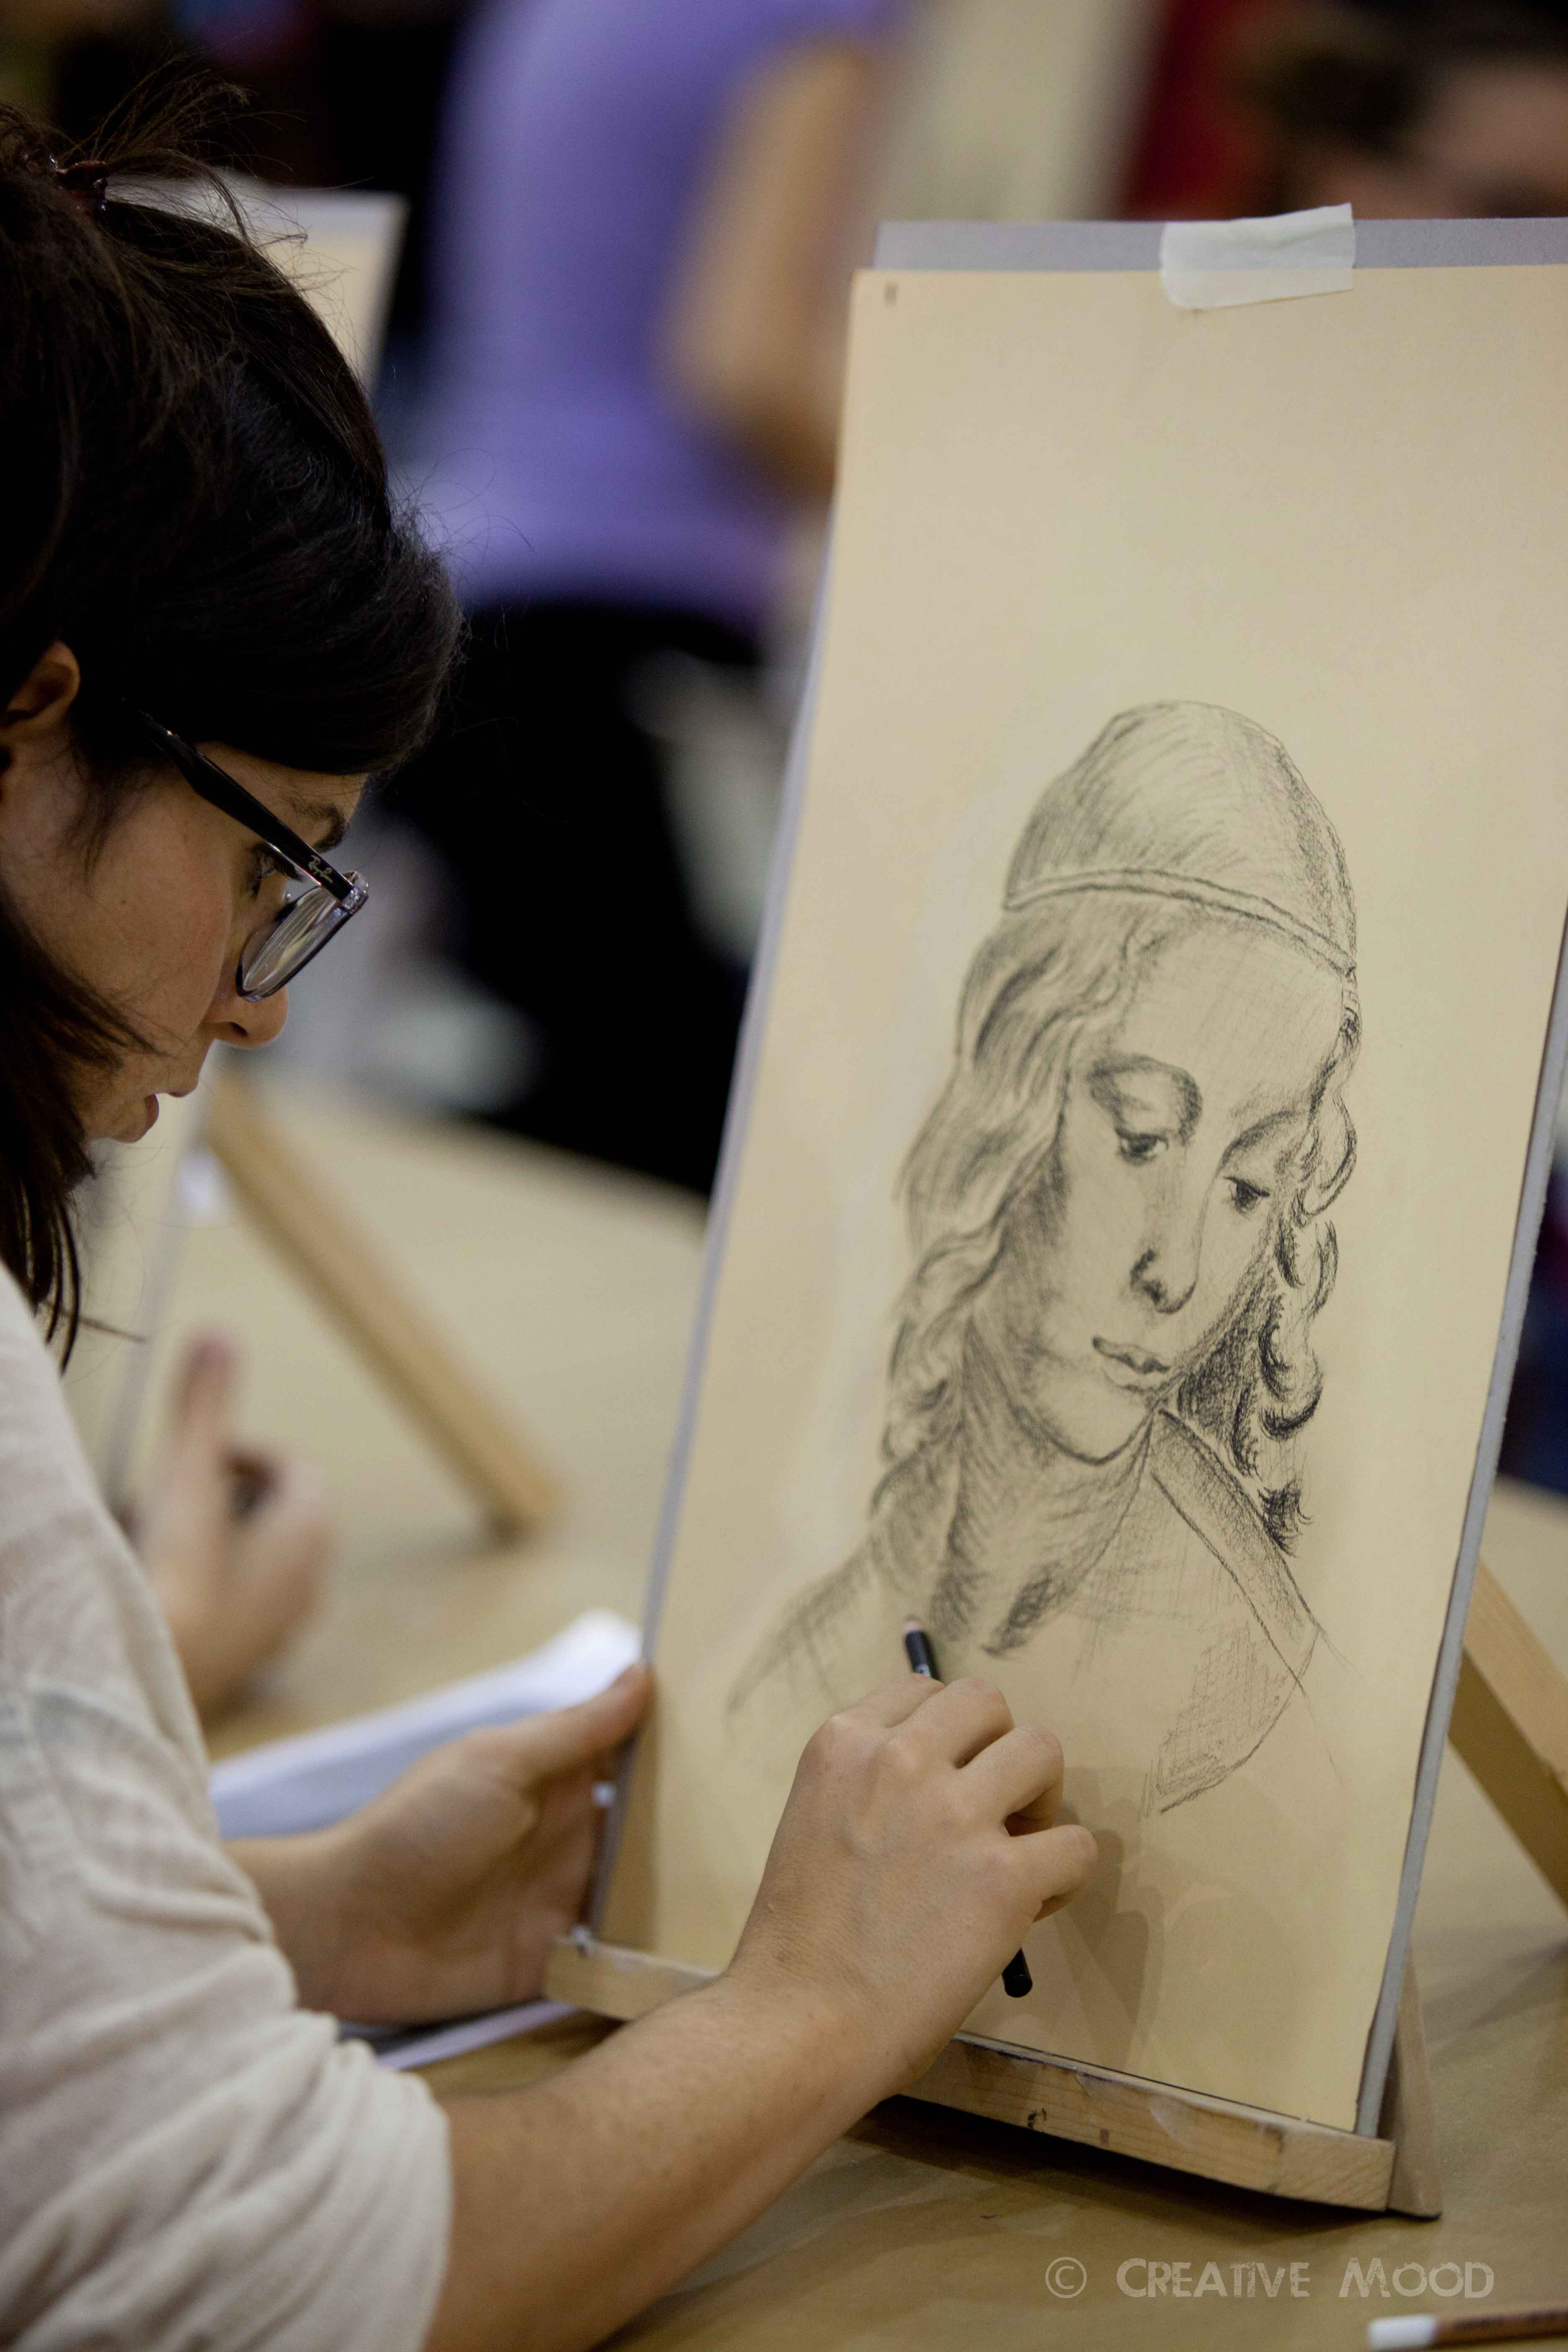 officina d'arte Hobby show fiera di roma-40.jpg